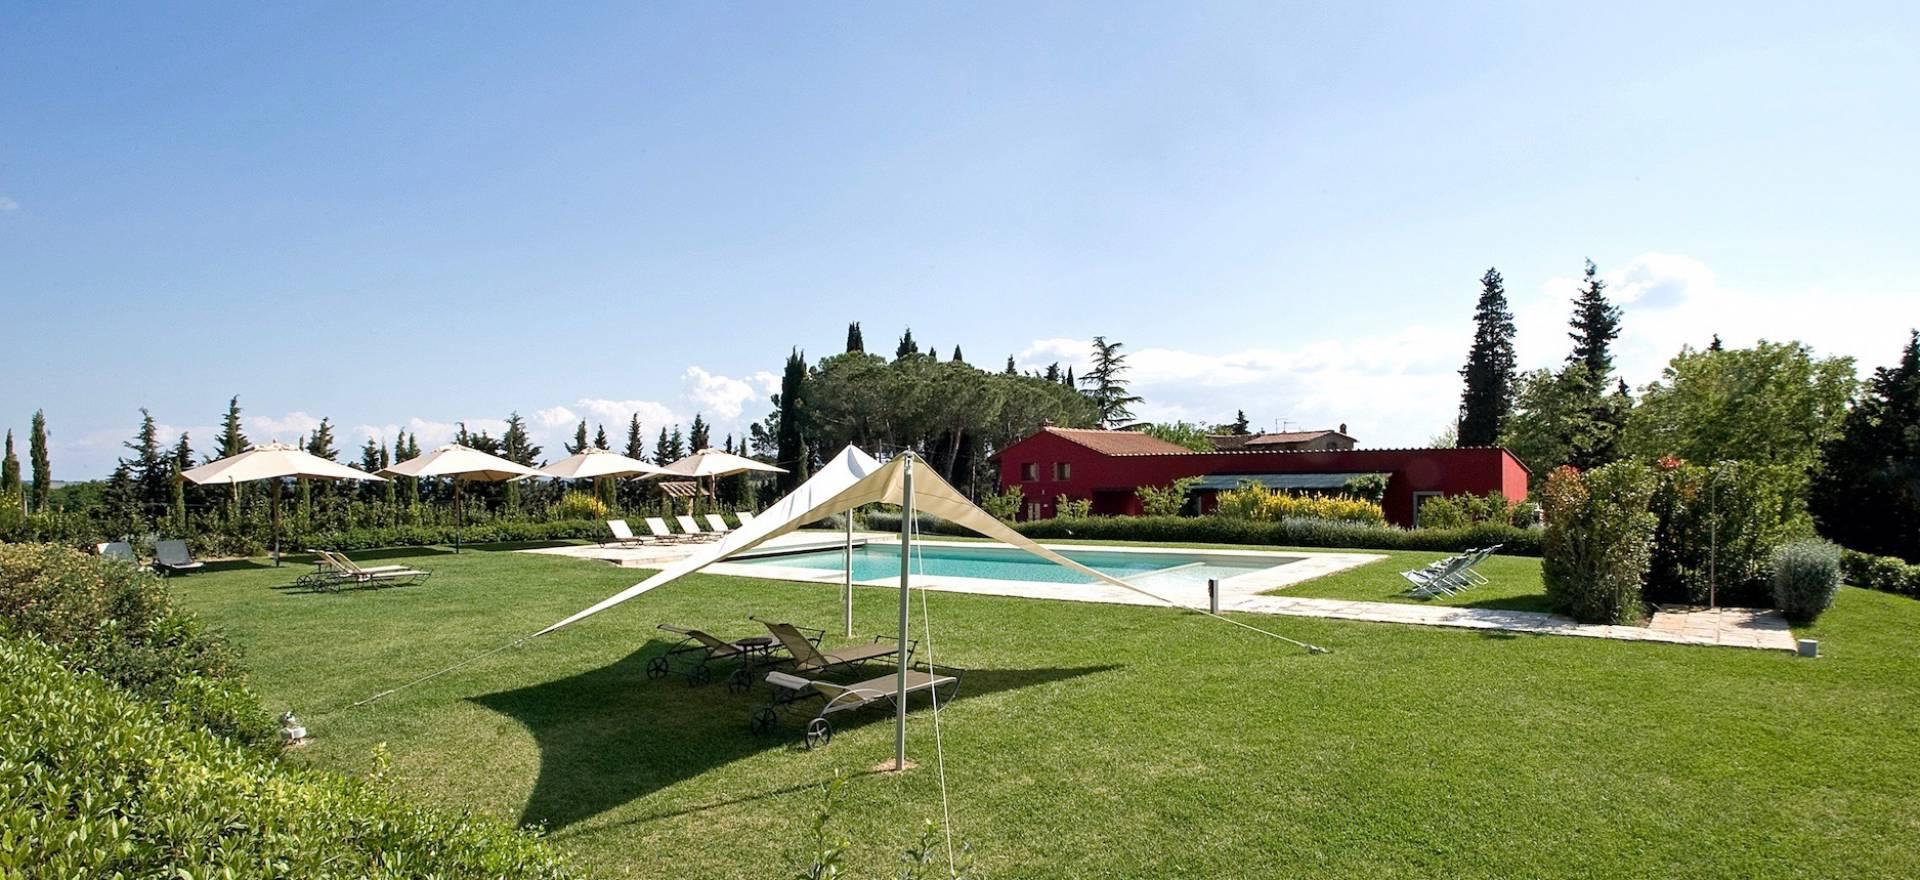 Luxe agriturismo in Toscane vlakbij San Gimignano